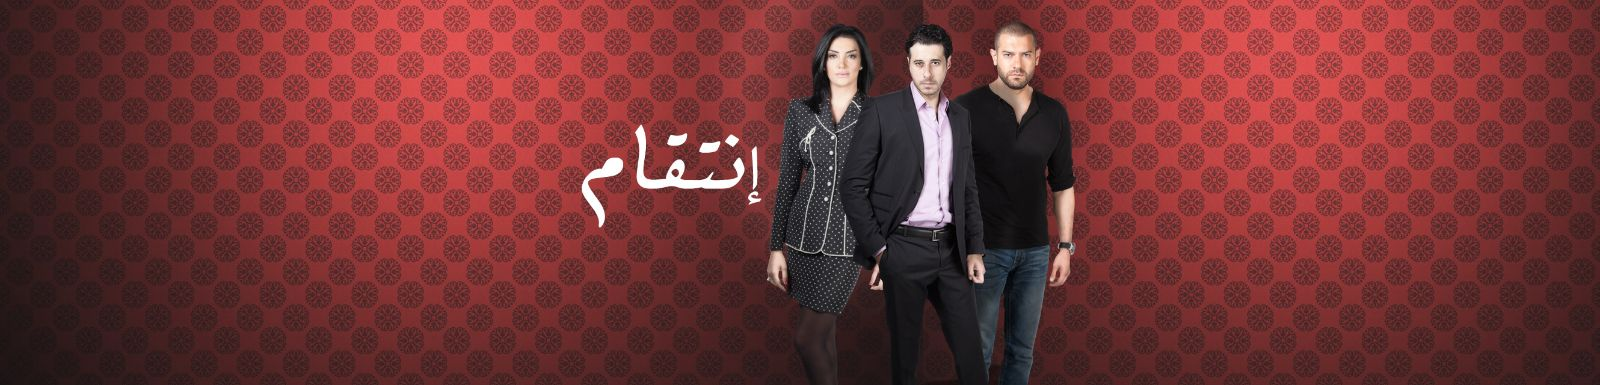 ����� ����� ������ ������ 24 MBC shahid ���� ��